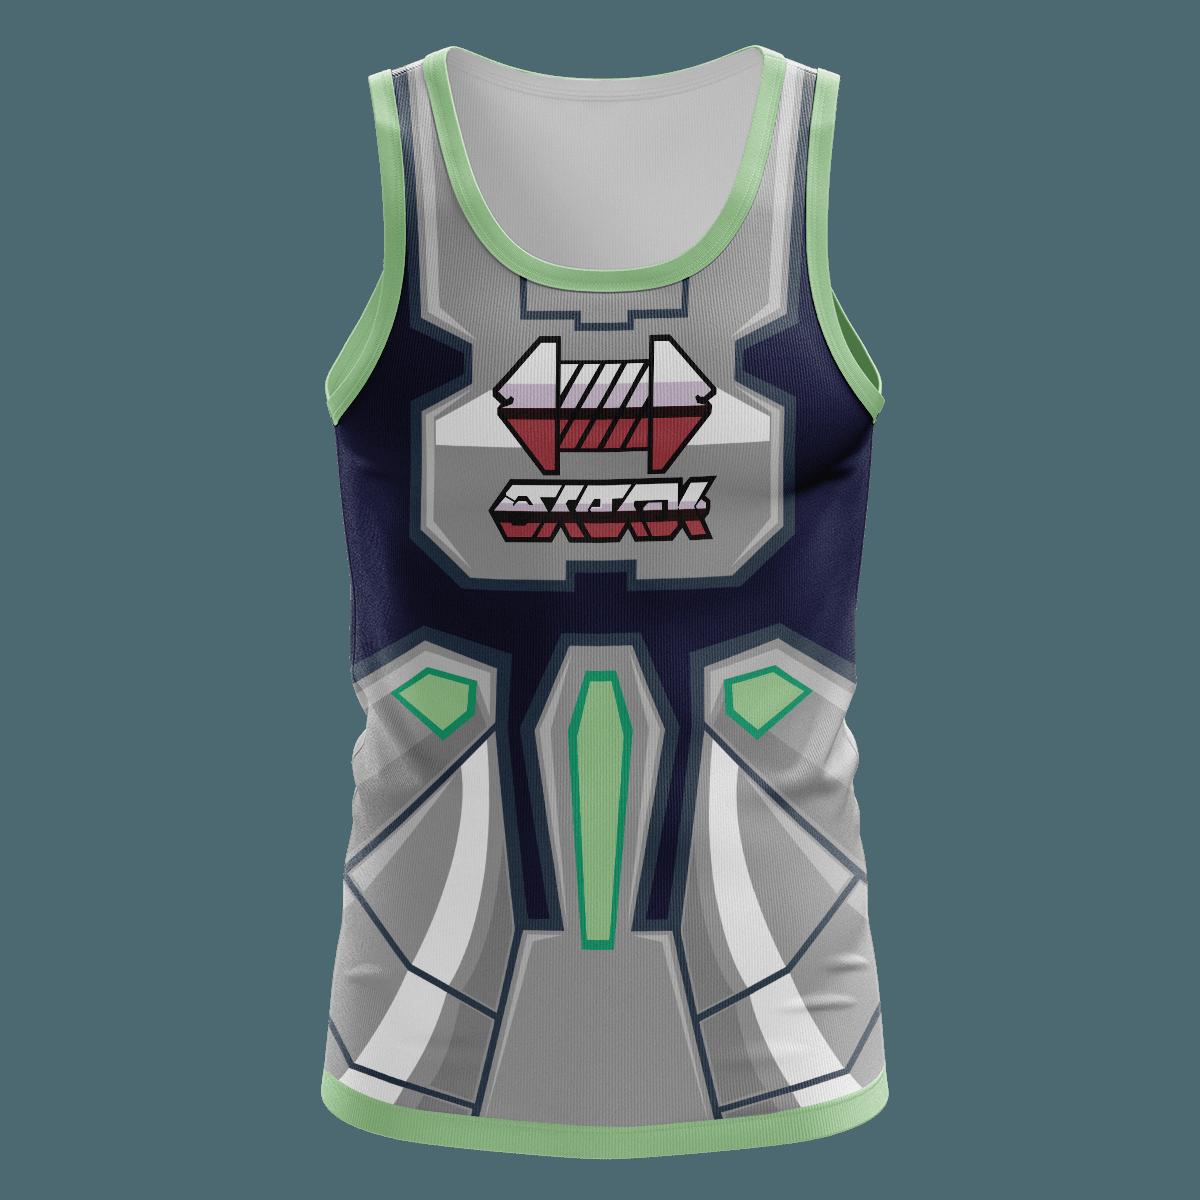 Pokemon Steel Uniform Unisex Tank Tops FDM3107 S Official Anime Swimsuit Merch